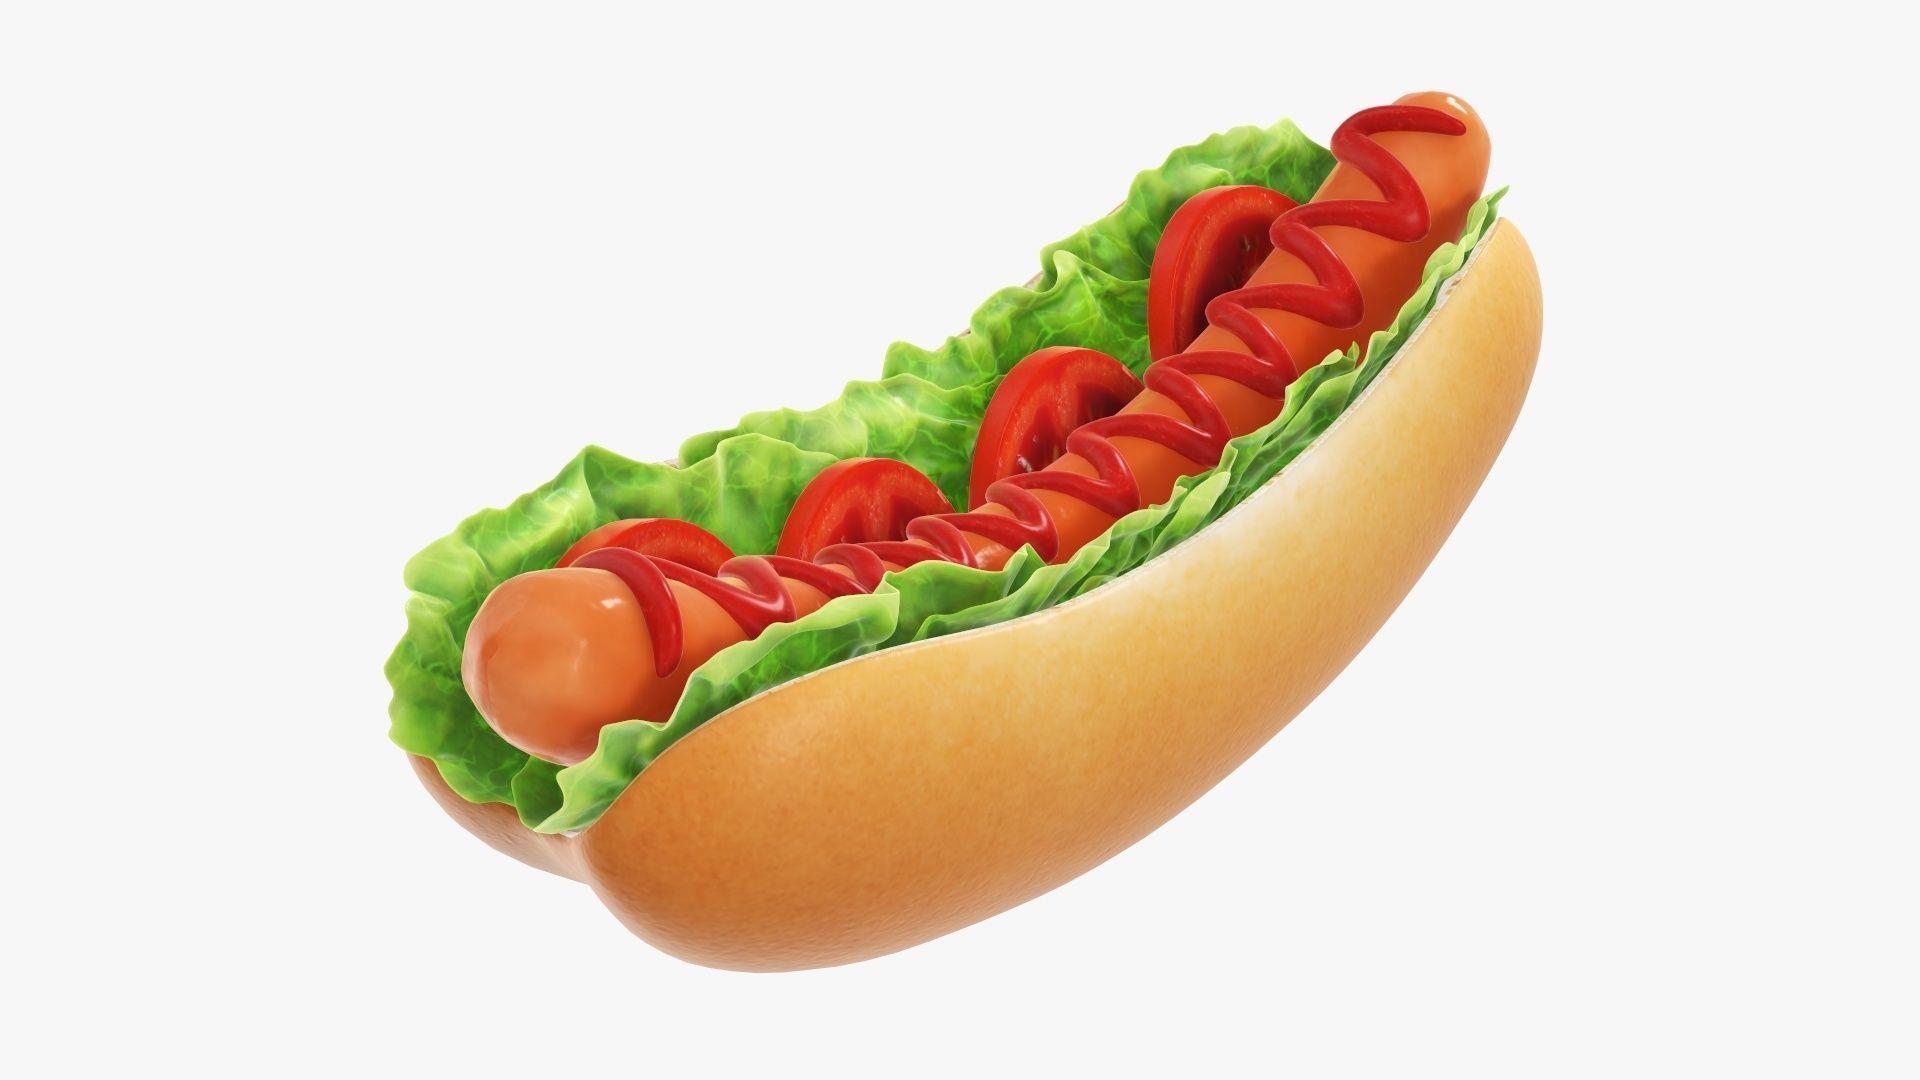 Hot dog with ketchup salad and tomato v2